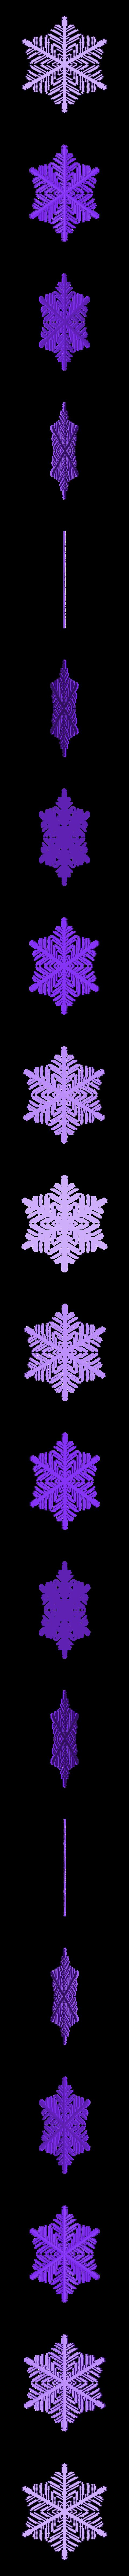 r40-rg2.stl Download free STL file Snowflake growth simulation in BlocksCAD • 3D printing design, arpruss